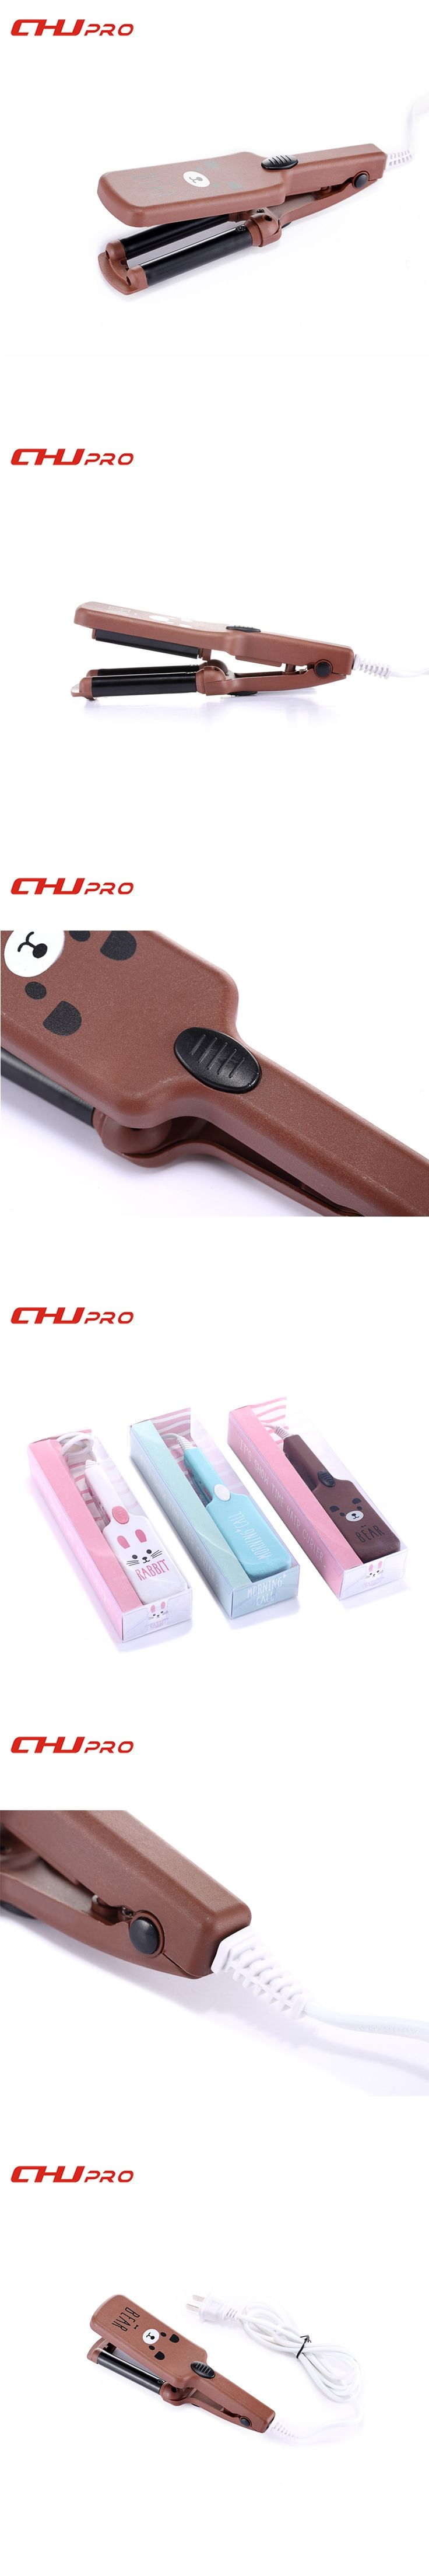 Mini Triple Barrels Hair Curling Iron Deep Waver Curling Wand Cartoon Hair Curlers Rollers 110-220V Hair Waver